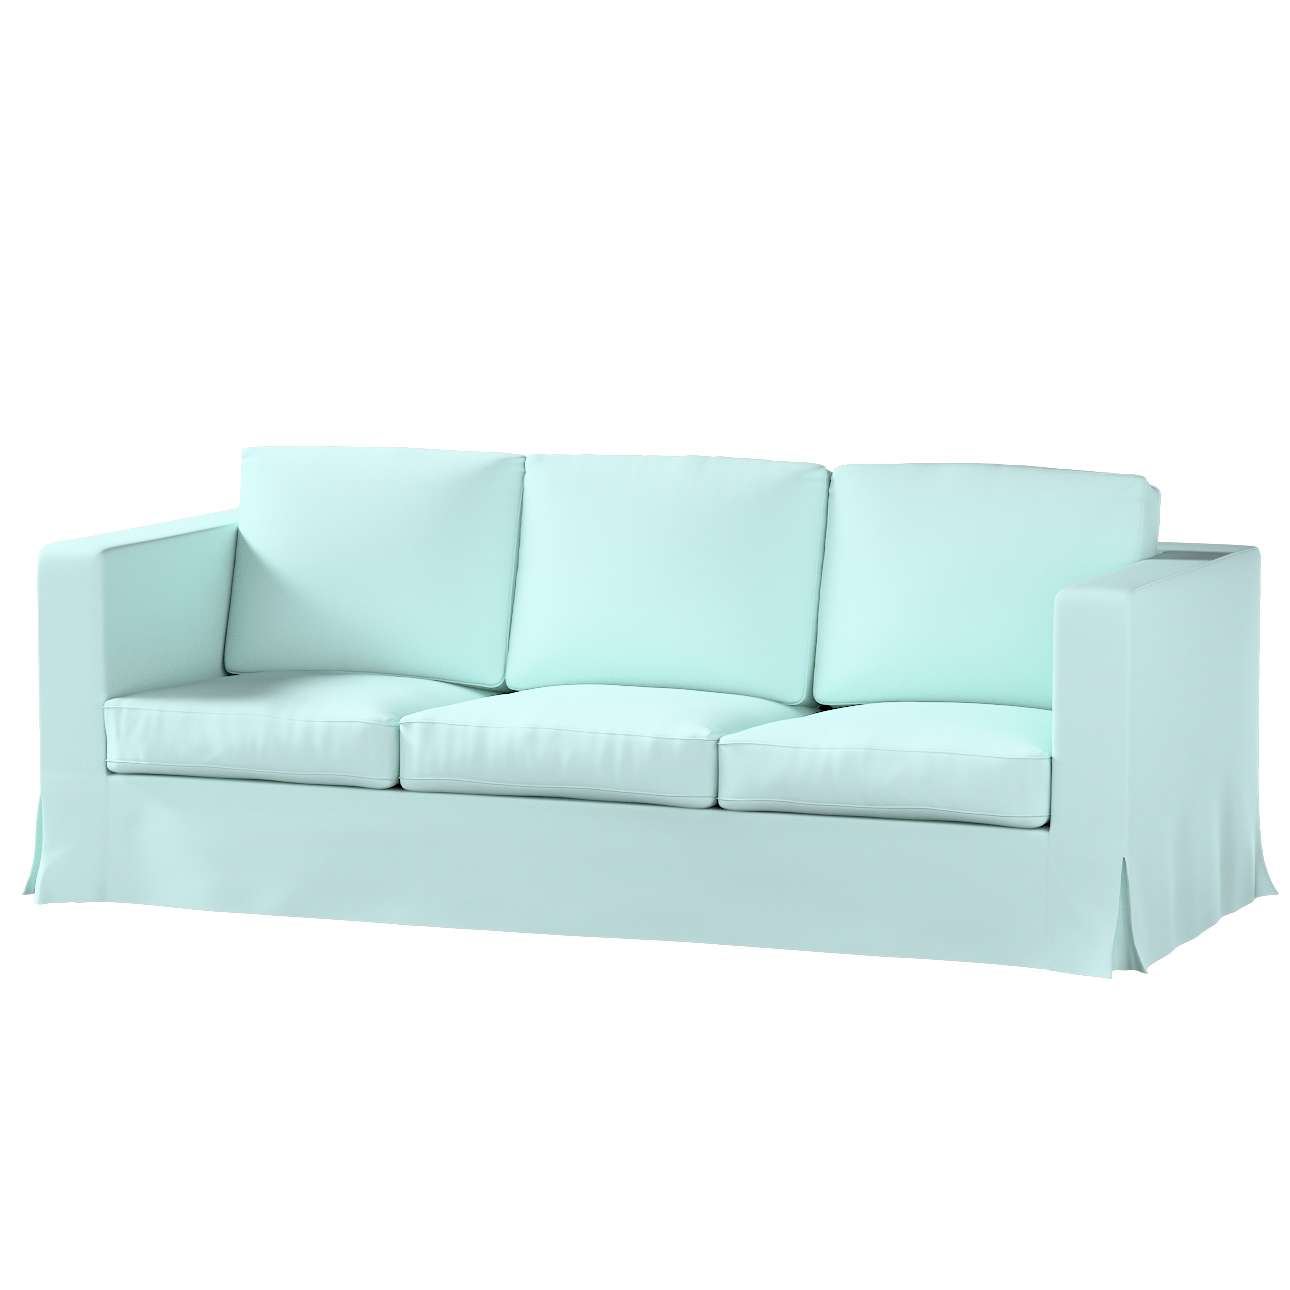 Karlanda klädsel 3-sits soffa - lång i kollektionen Panama Cotton, Tyg: 702-10